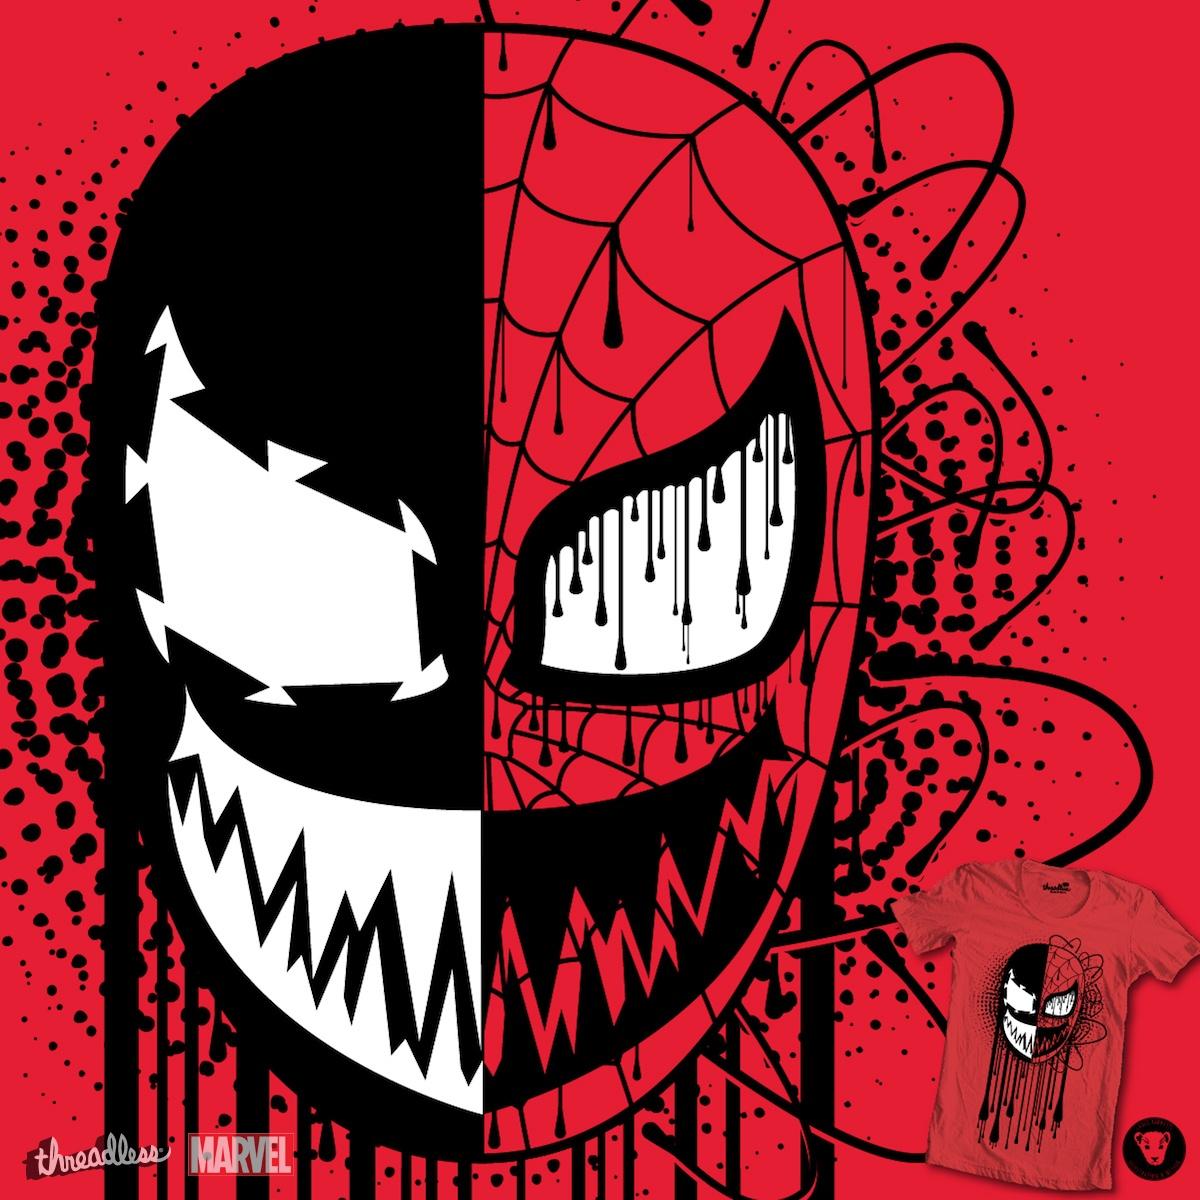 Venom/Carnage  by NJ Orange-Man on Threadless